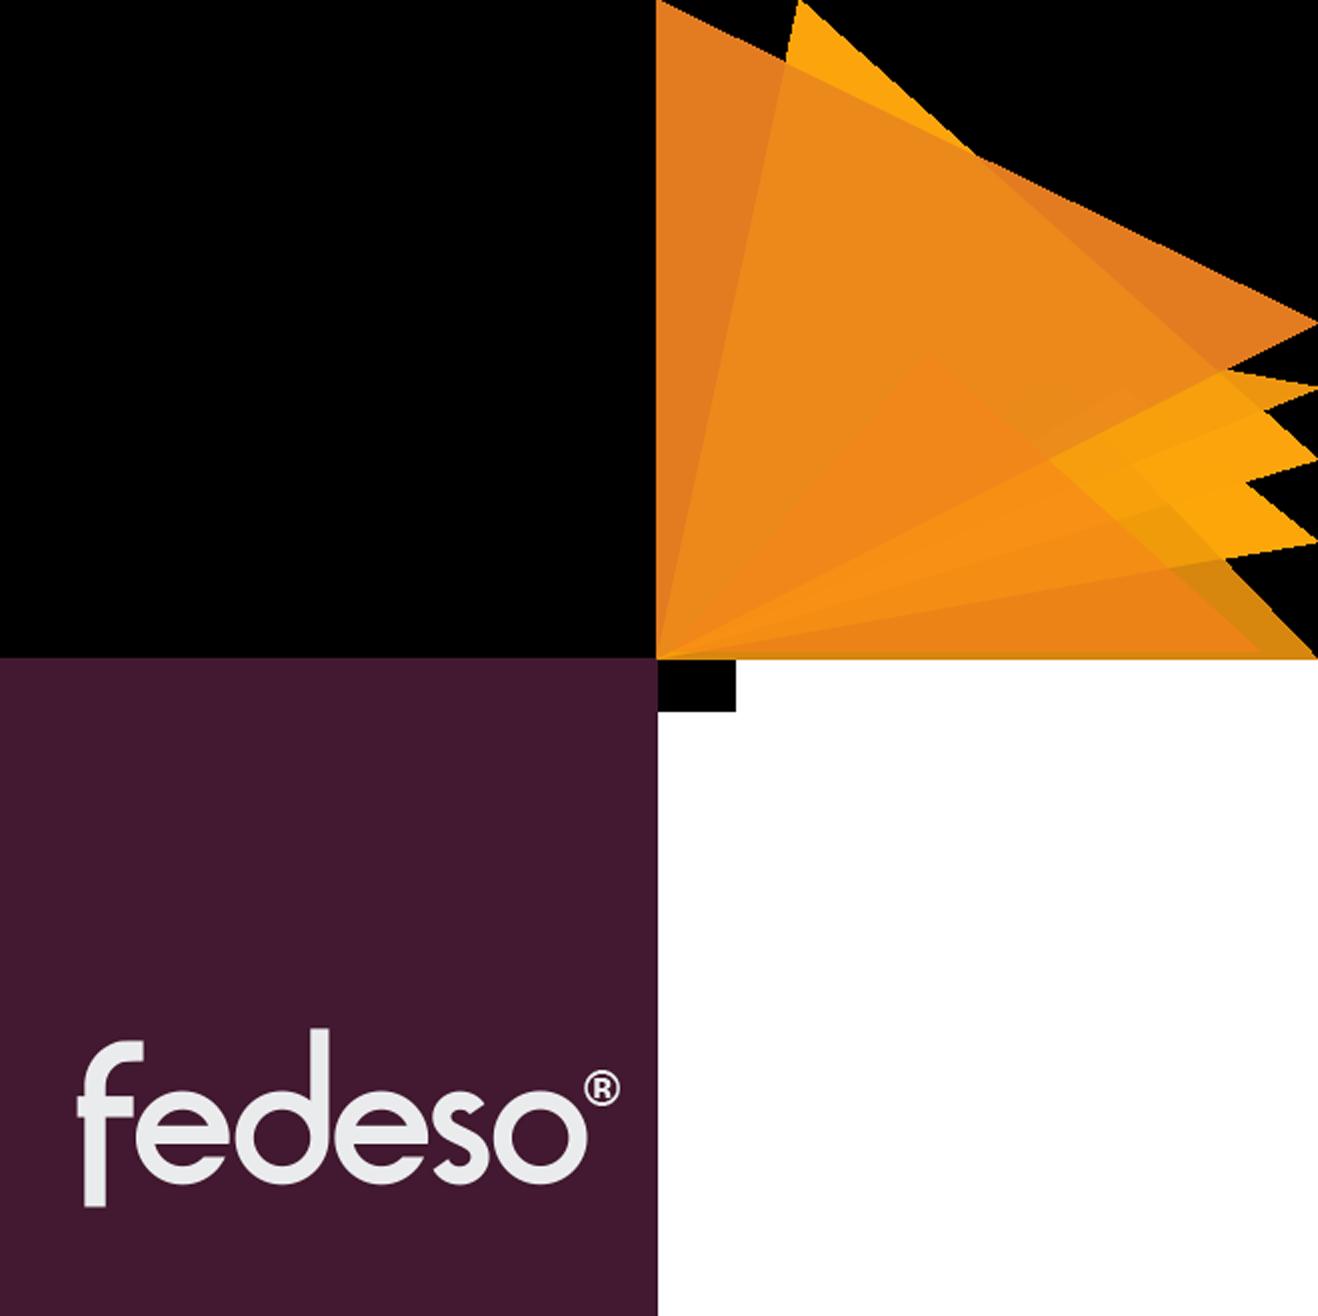 FEDESO srl